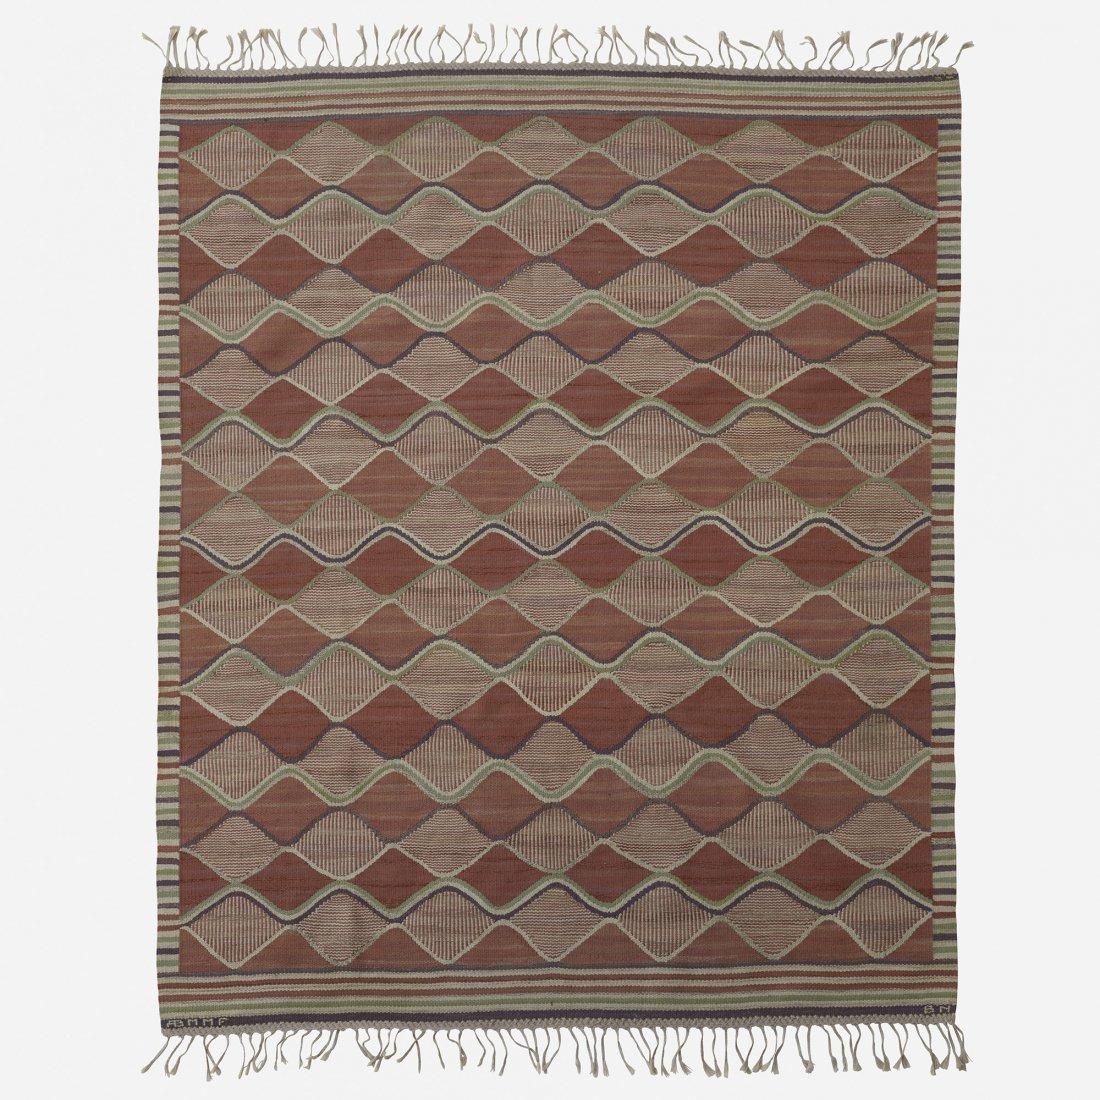 104: Barbro Nilsson Spättan carpet